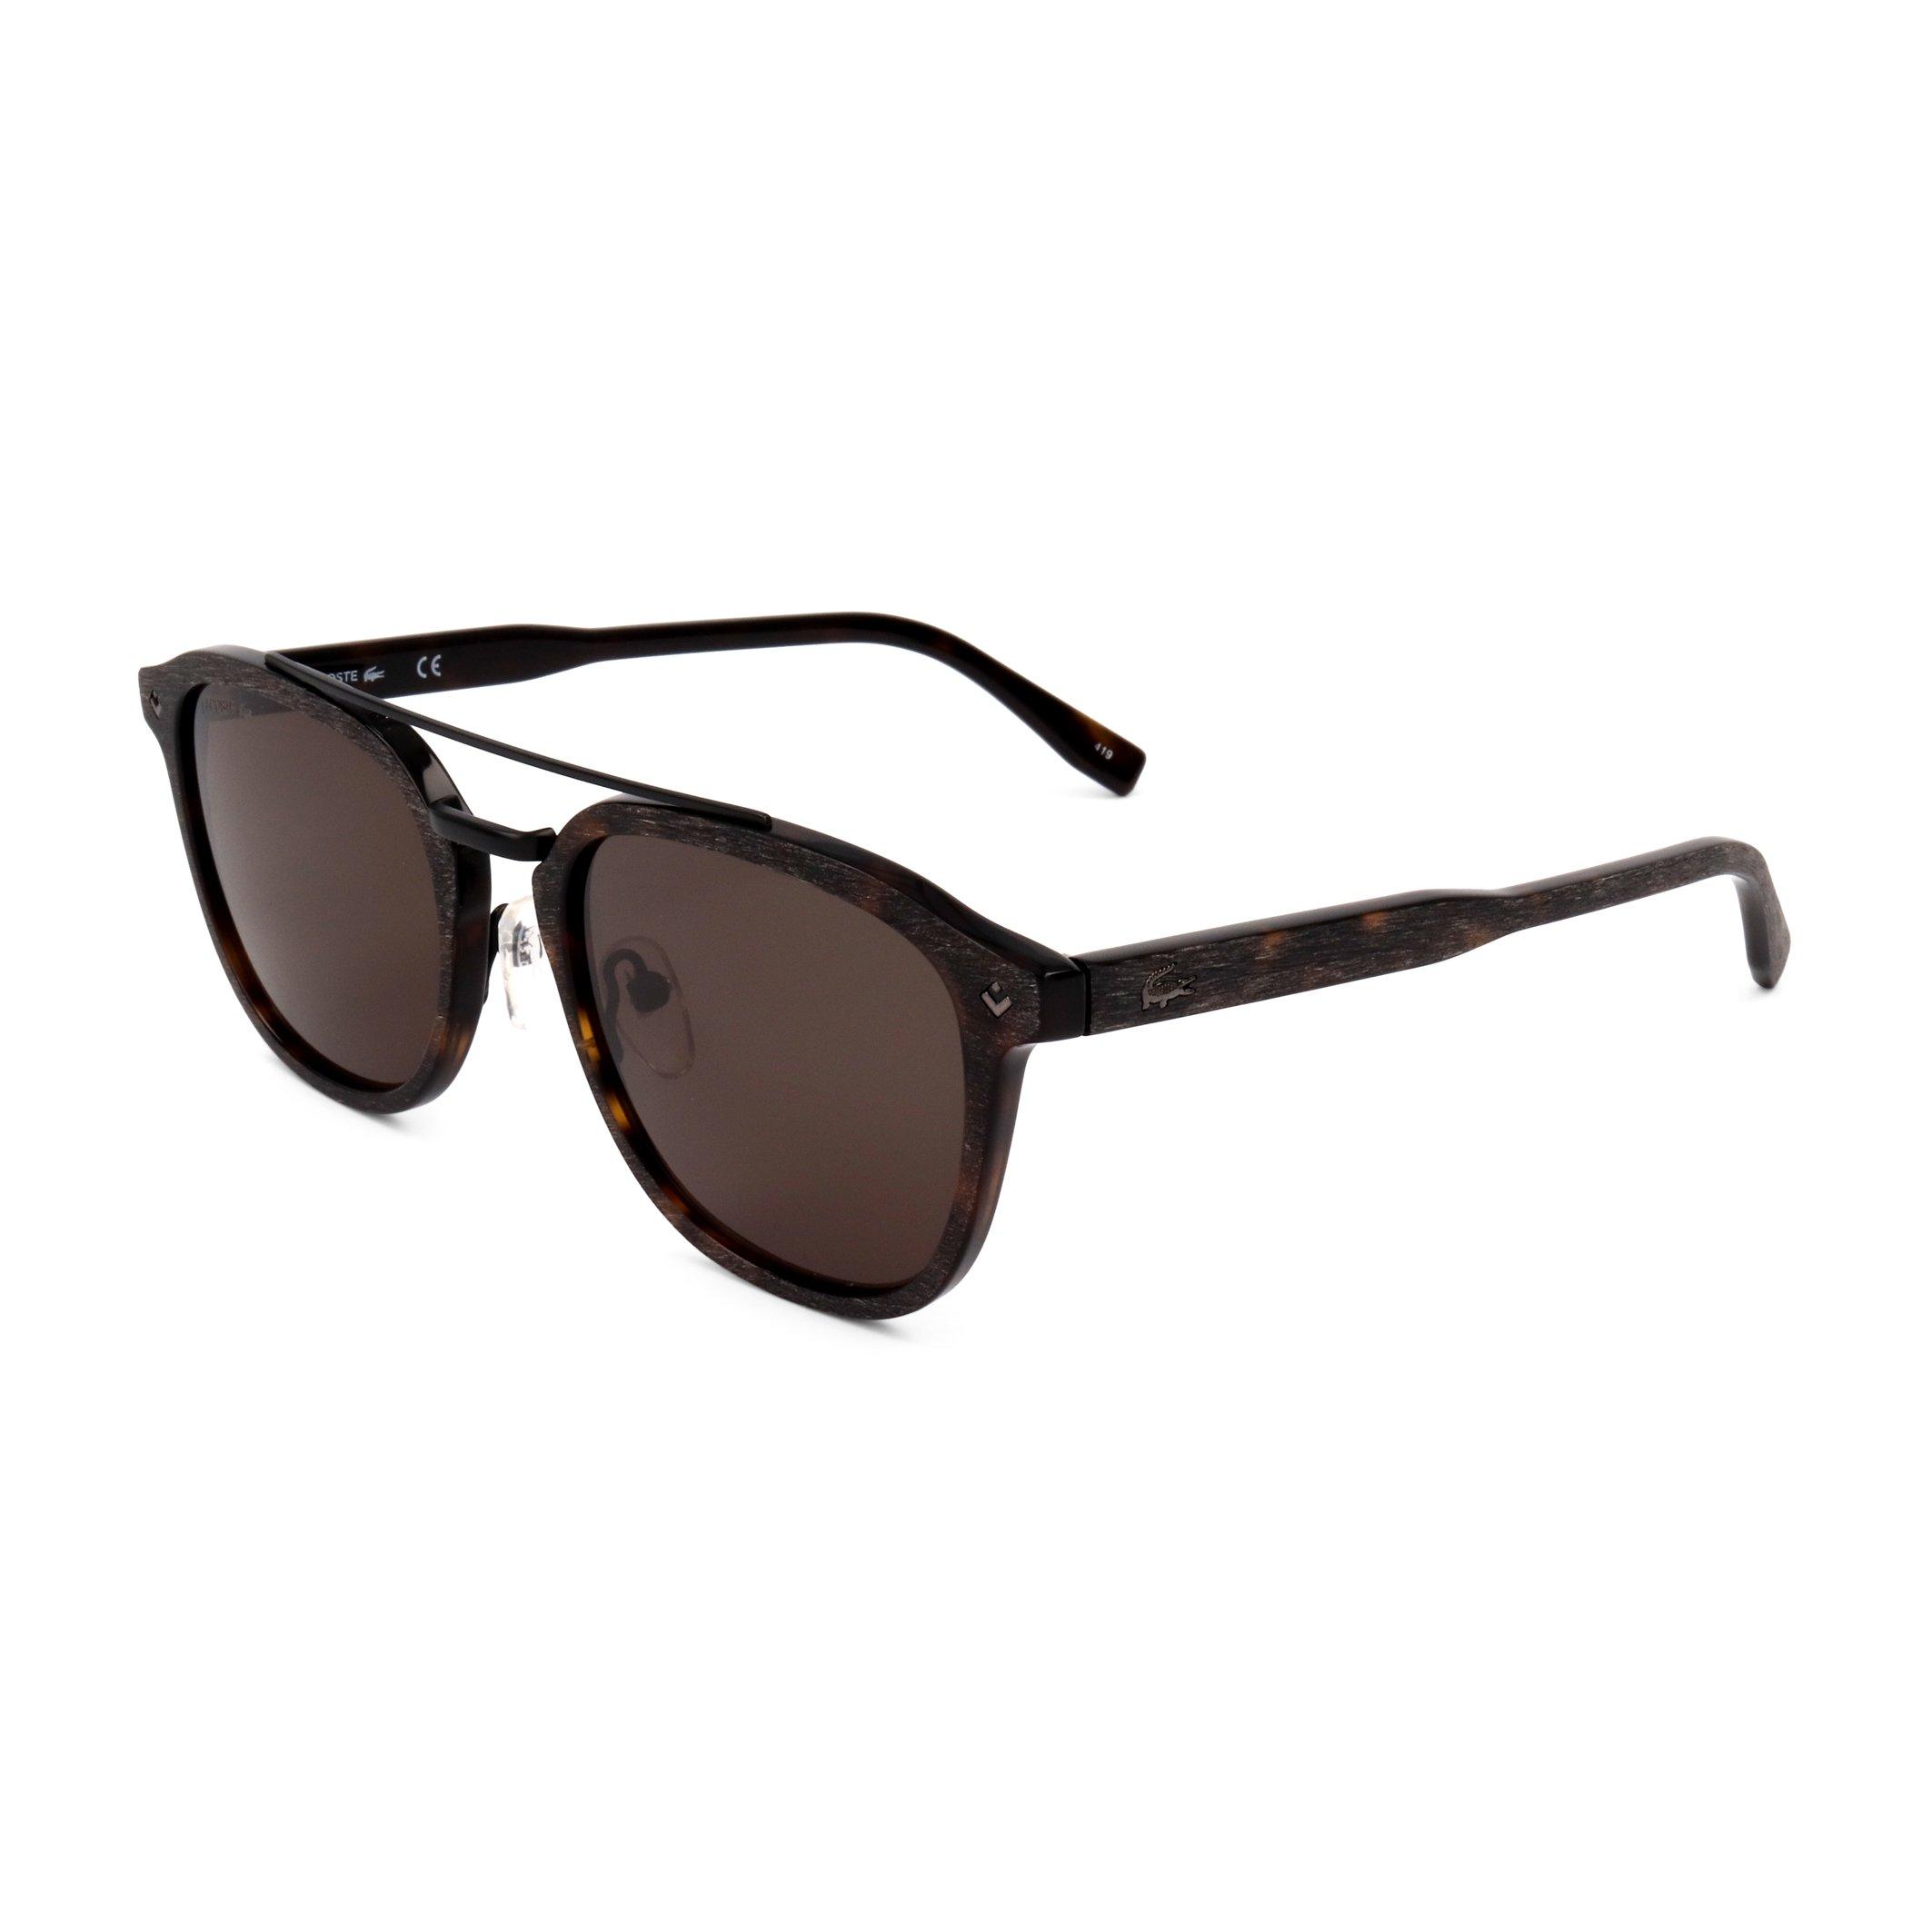 Lacoste Unisex Sunglasses Grey L885S_38752 - brown NOSIZE